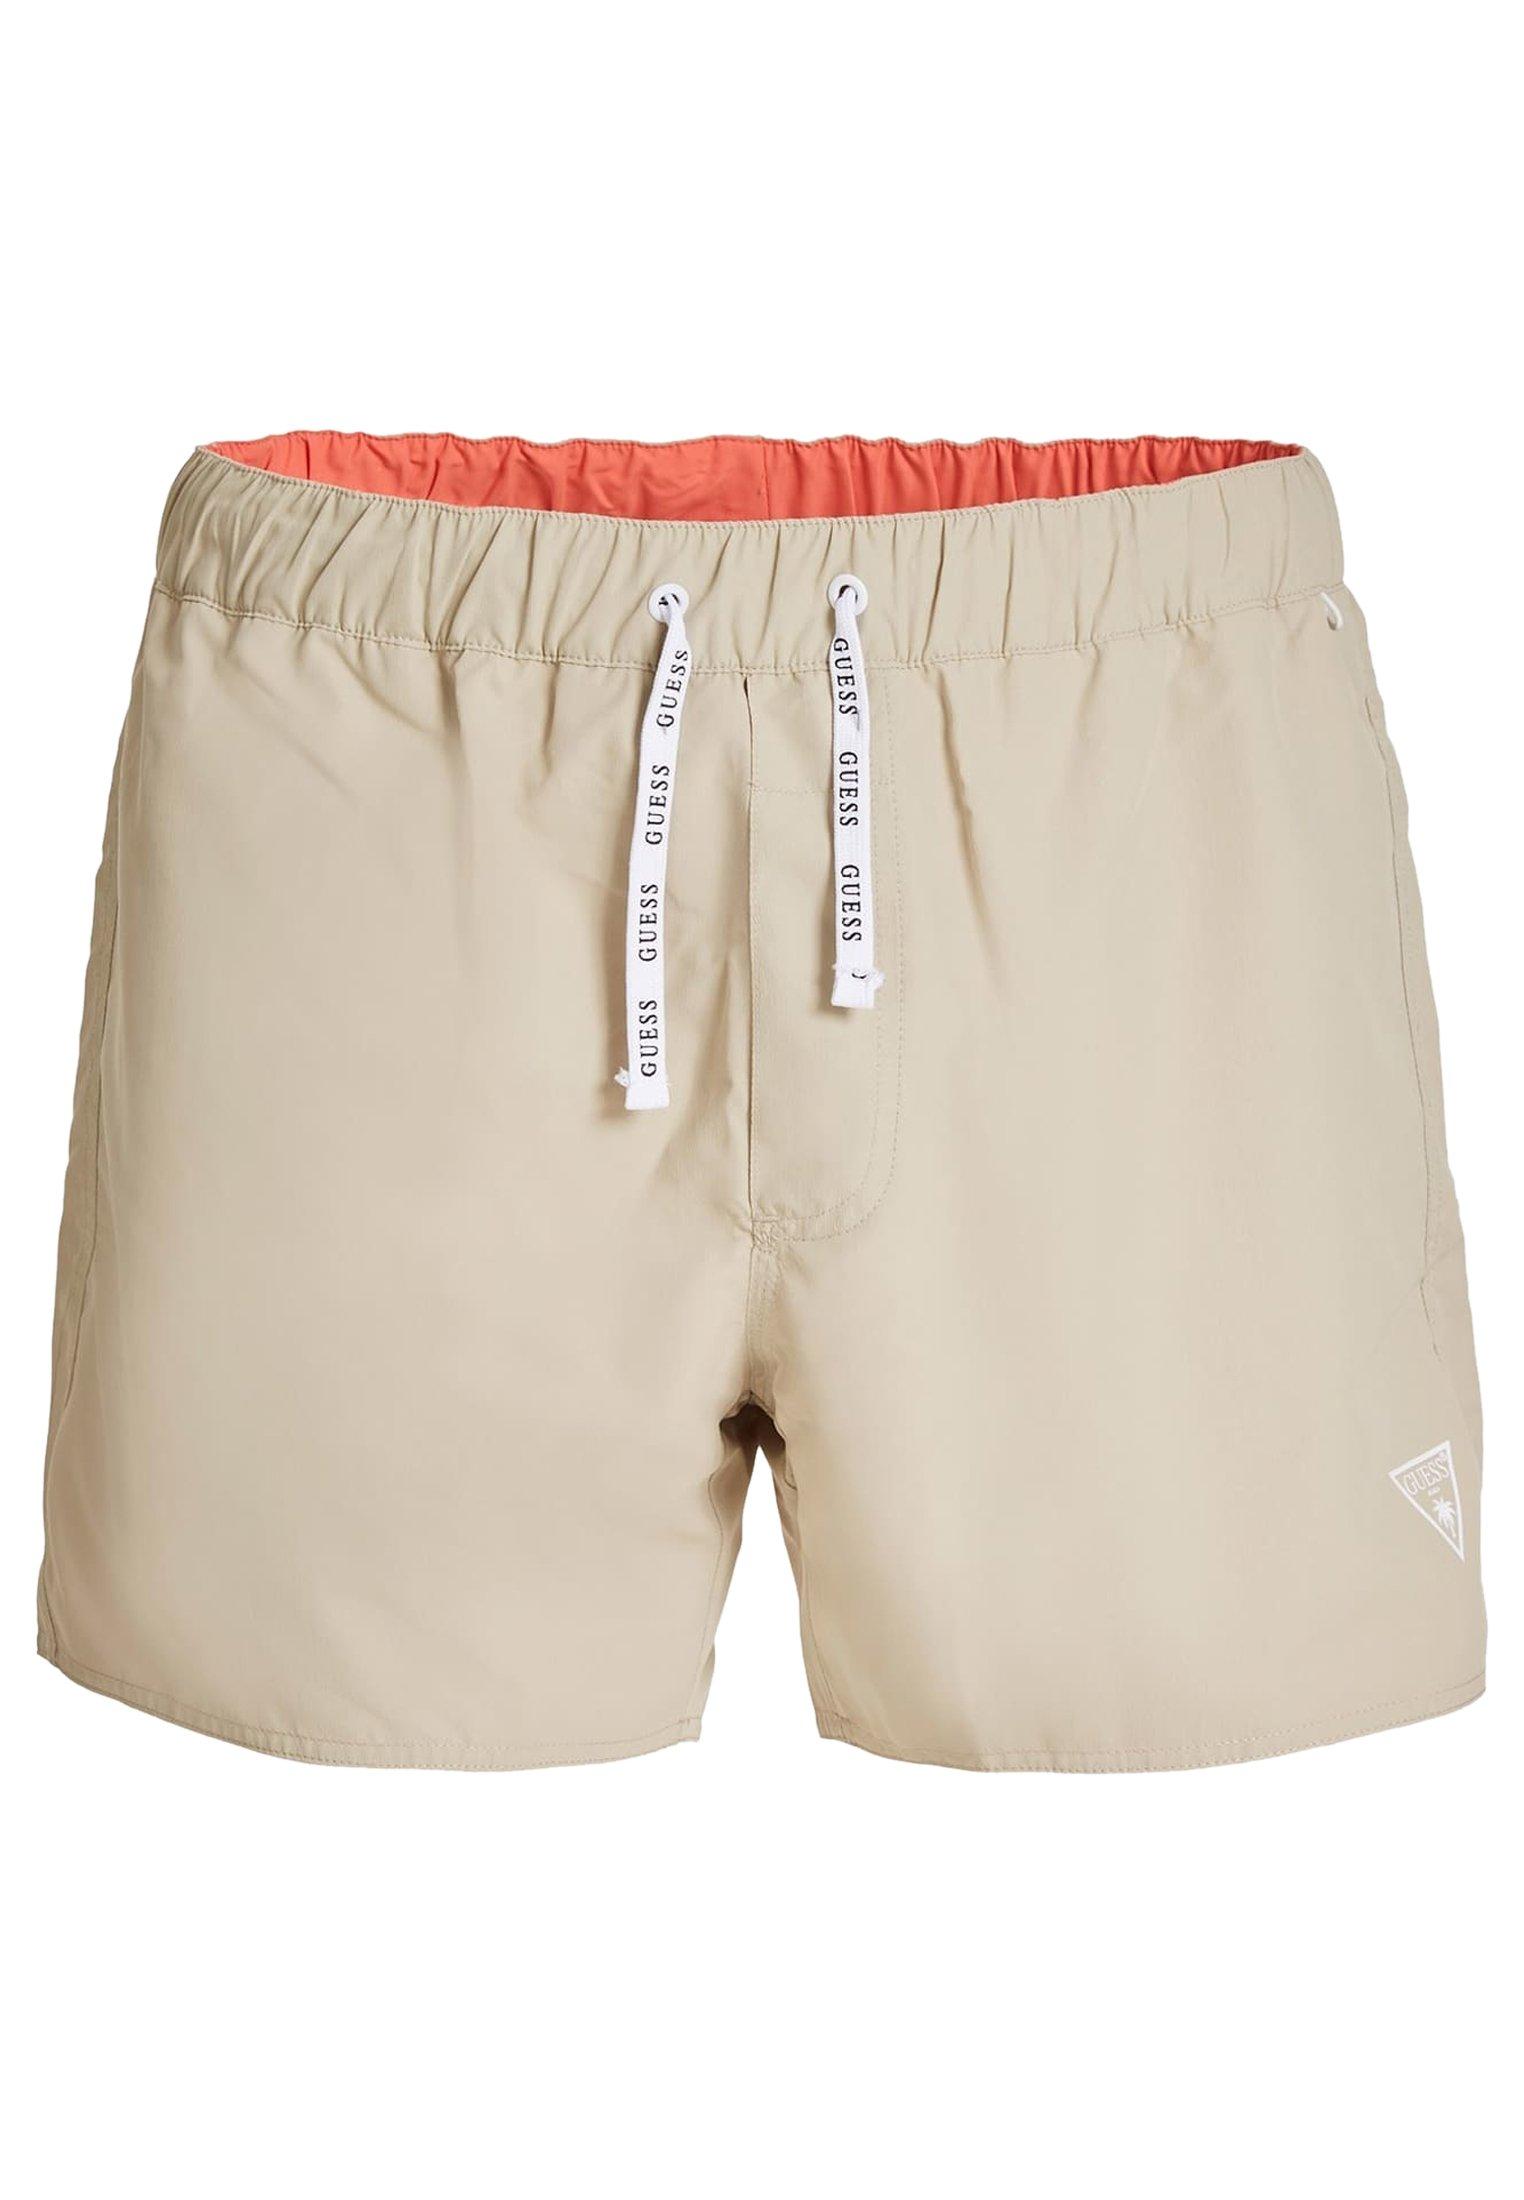 Guess Wende-badeshorts - Shorts Da Mare Orange CR294